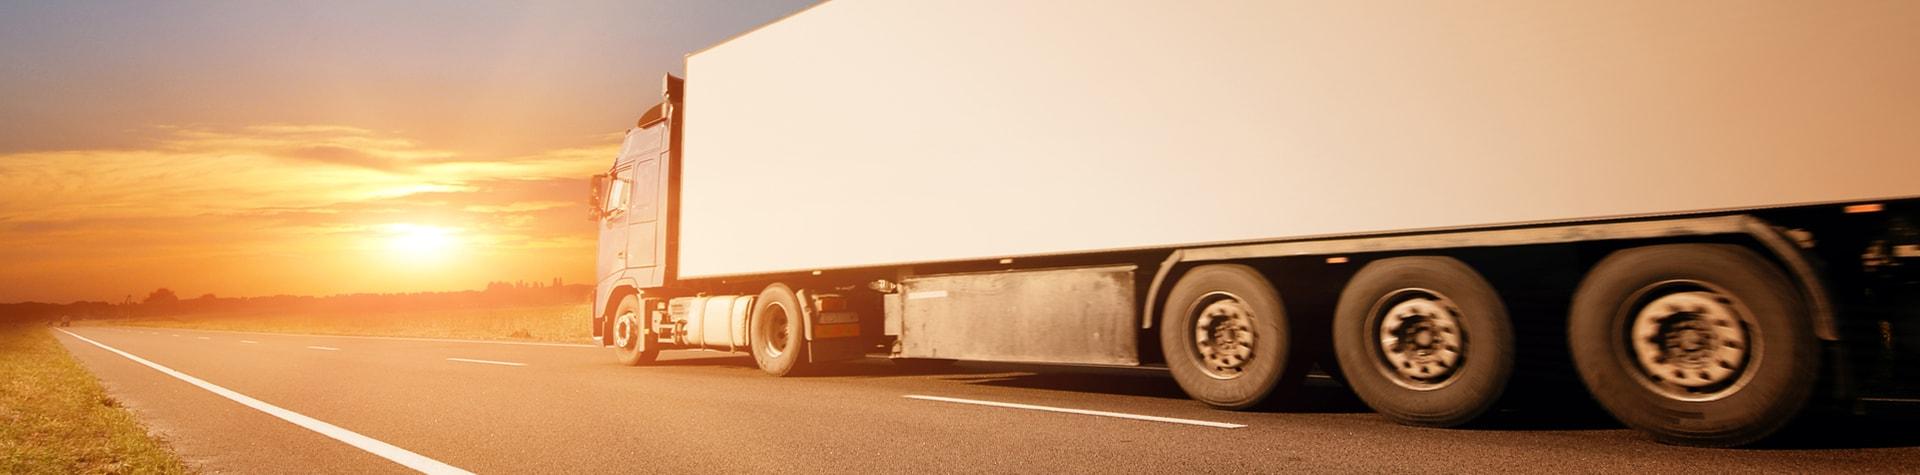 Monitorizare auto prin GPS pentru Transport Marfă & Internațional | evogps.ro